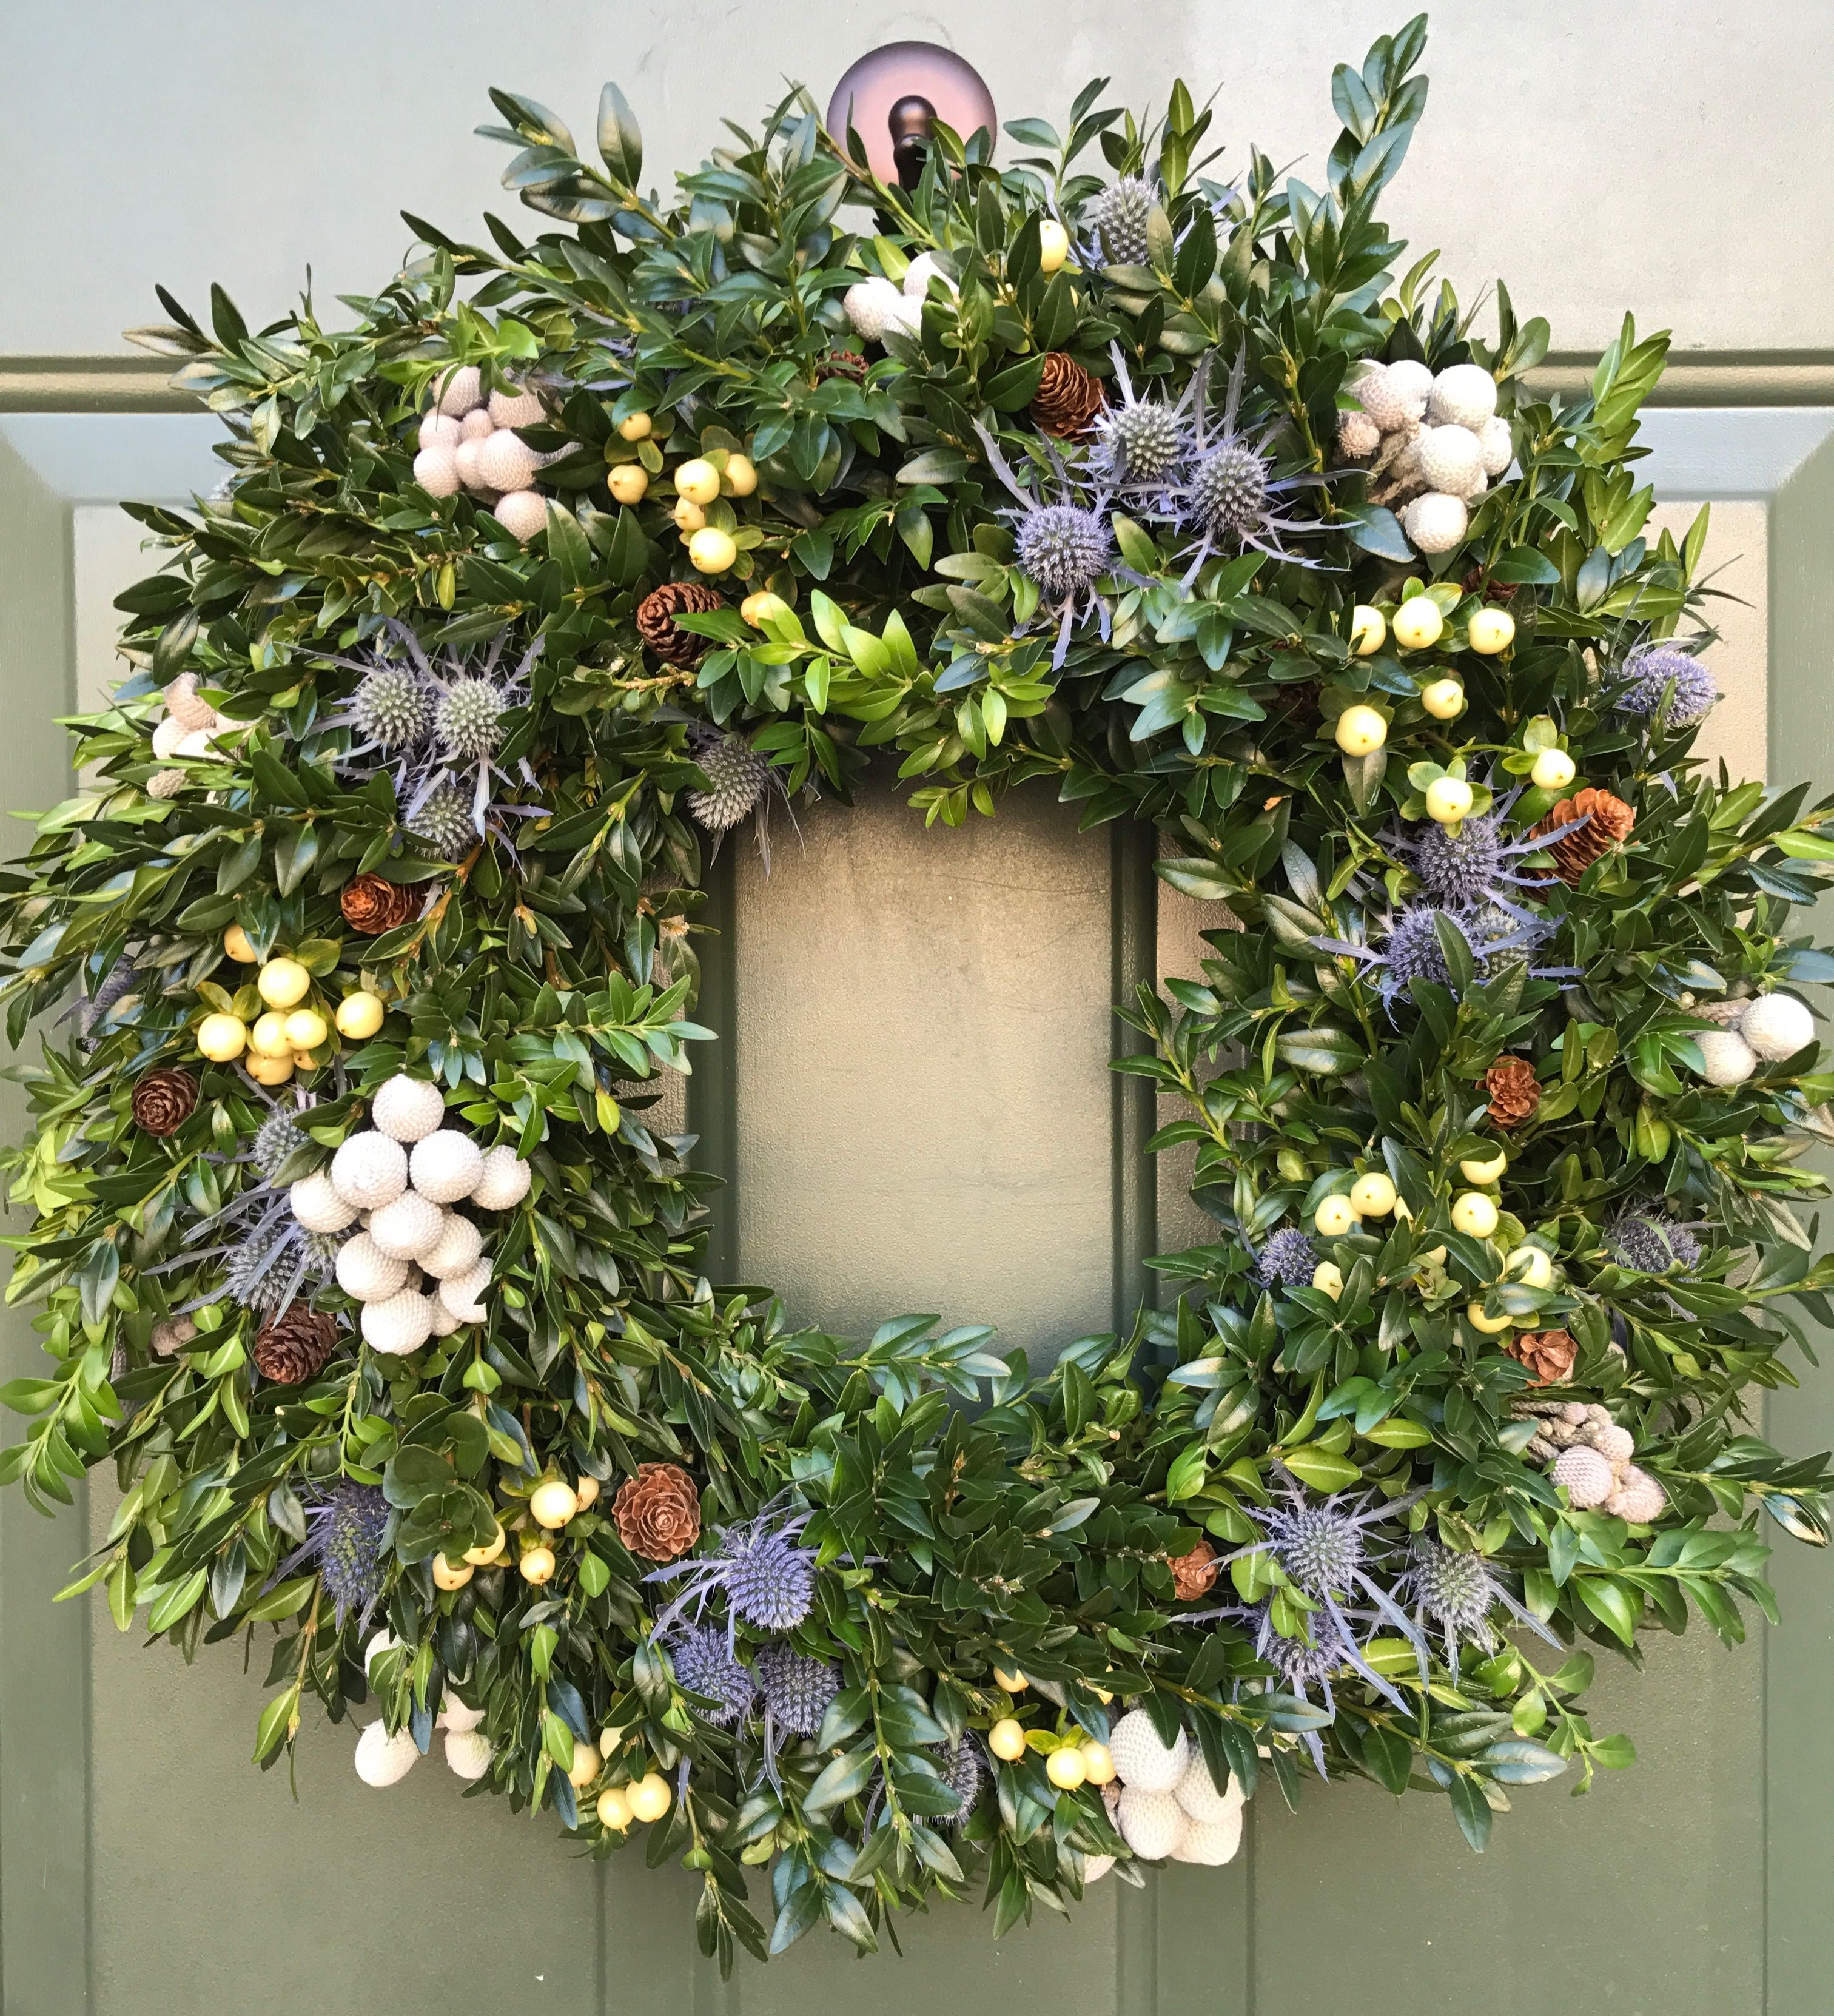 Holiday door wreath with fresh boxwood, white hypericum